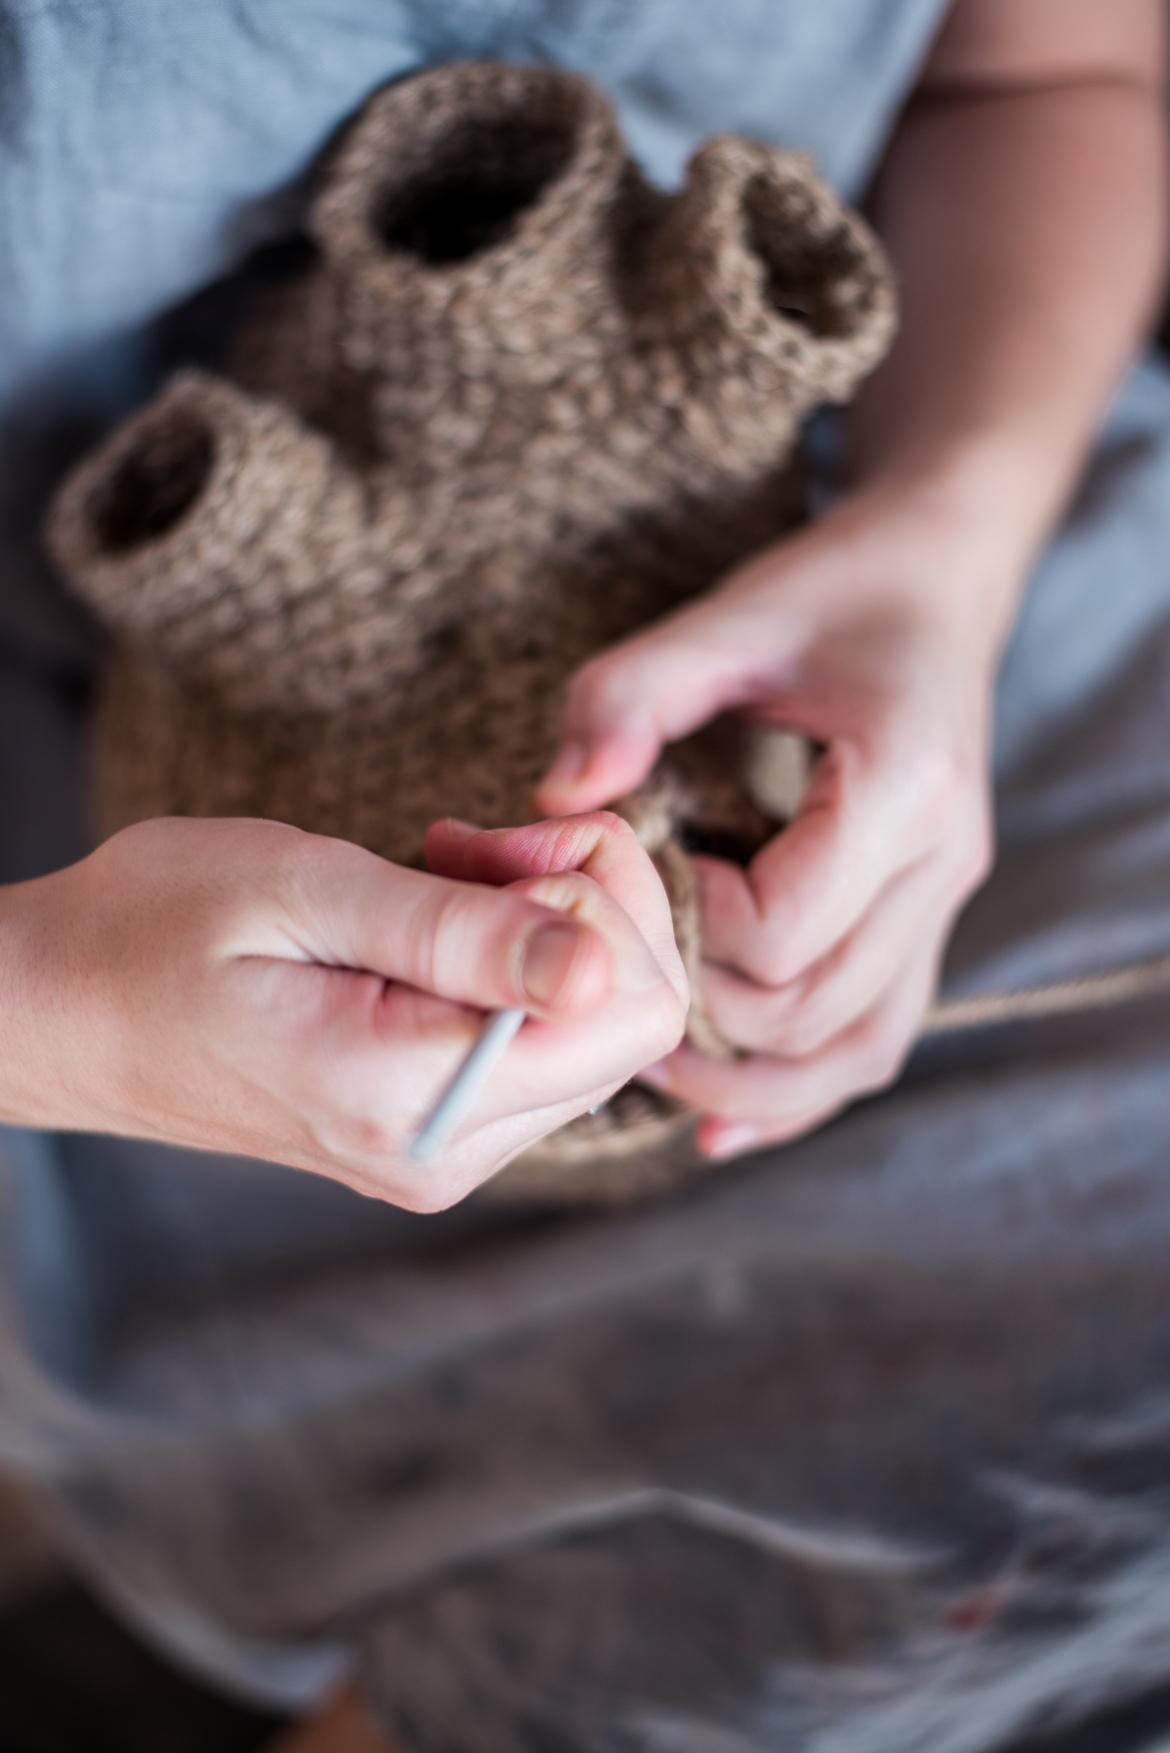 Holly Mcfeen, an artist from Freemantle Arts Centre in Australia knitting an artefact at Art Ichol